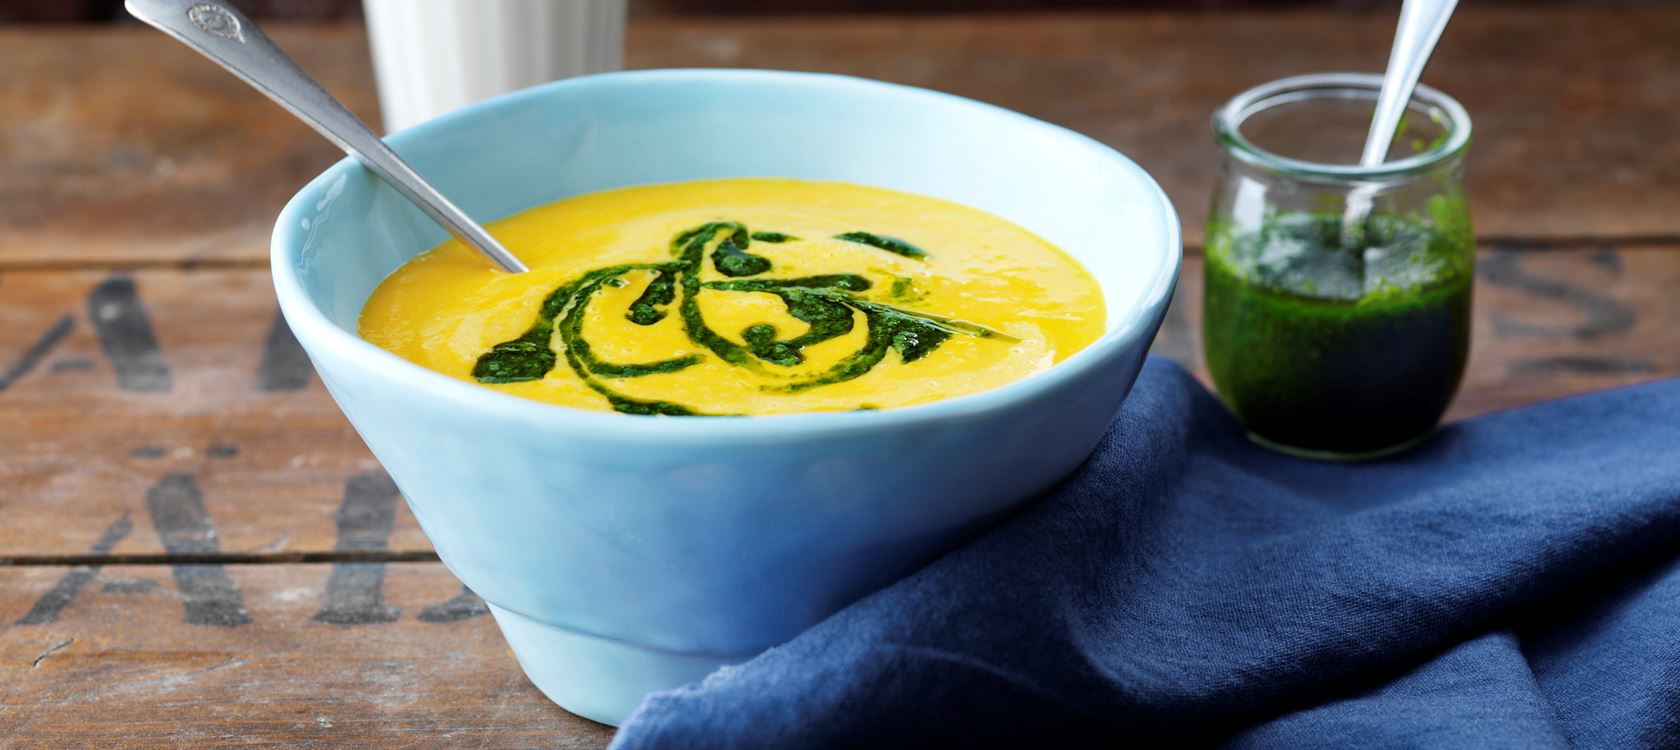 Herbstliche Wurzelgemüse-Suppe mit Arla Buko®